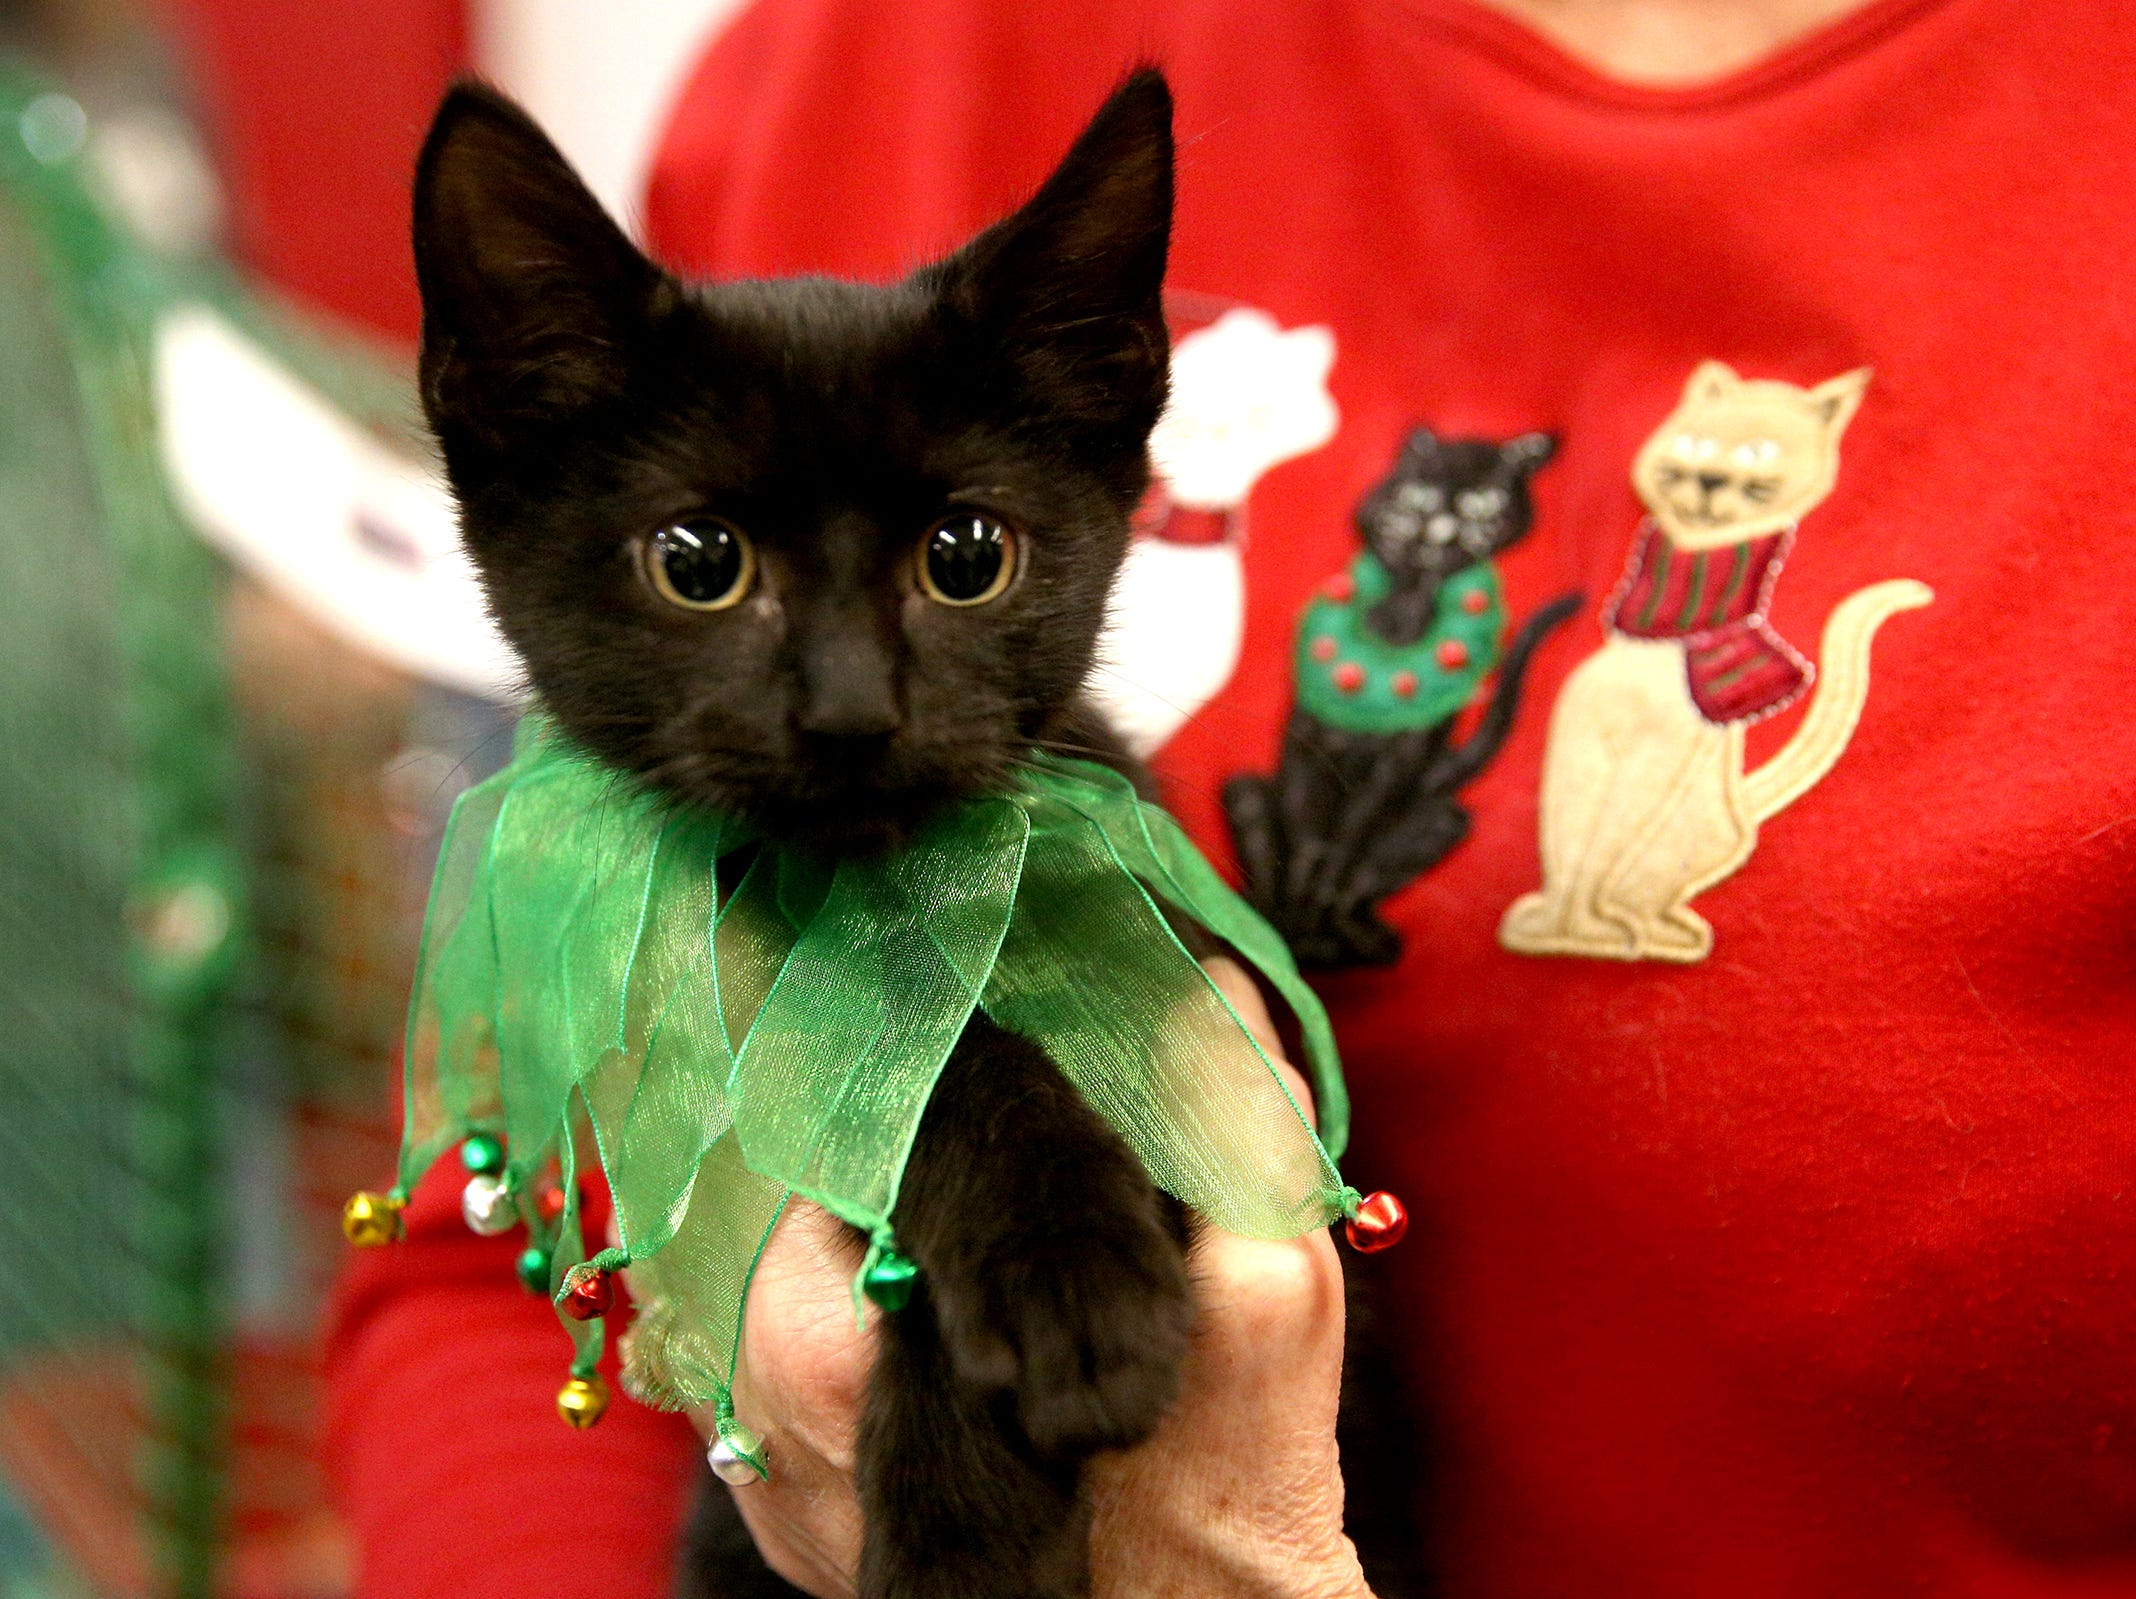 Salem Friends of Felines hosts a cat adoption at the Salem Holiday Market on Saturday, Dec. 8, 2018.